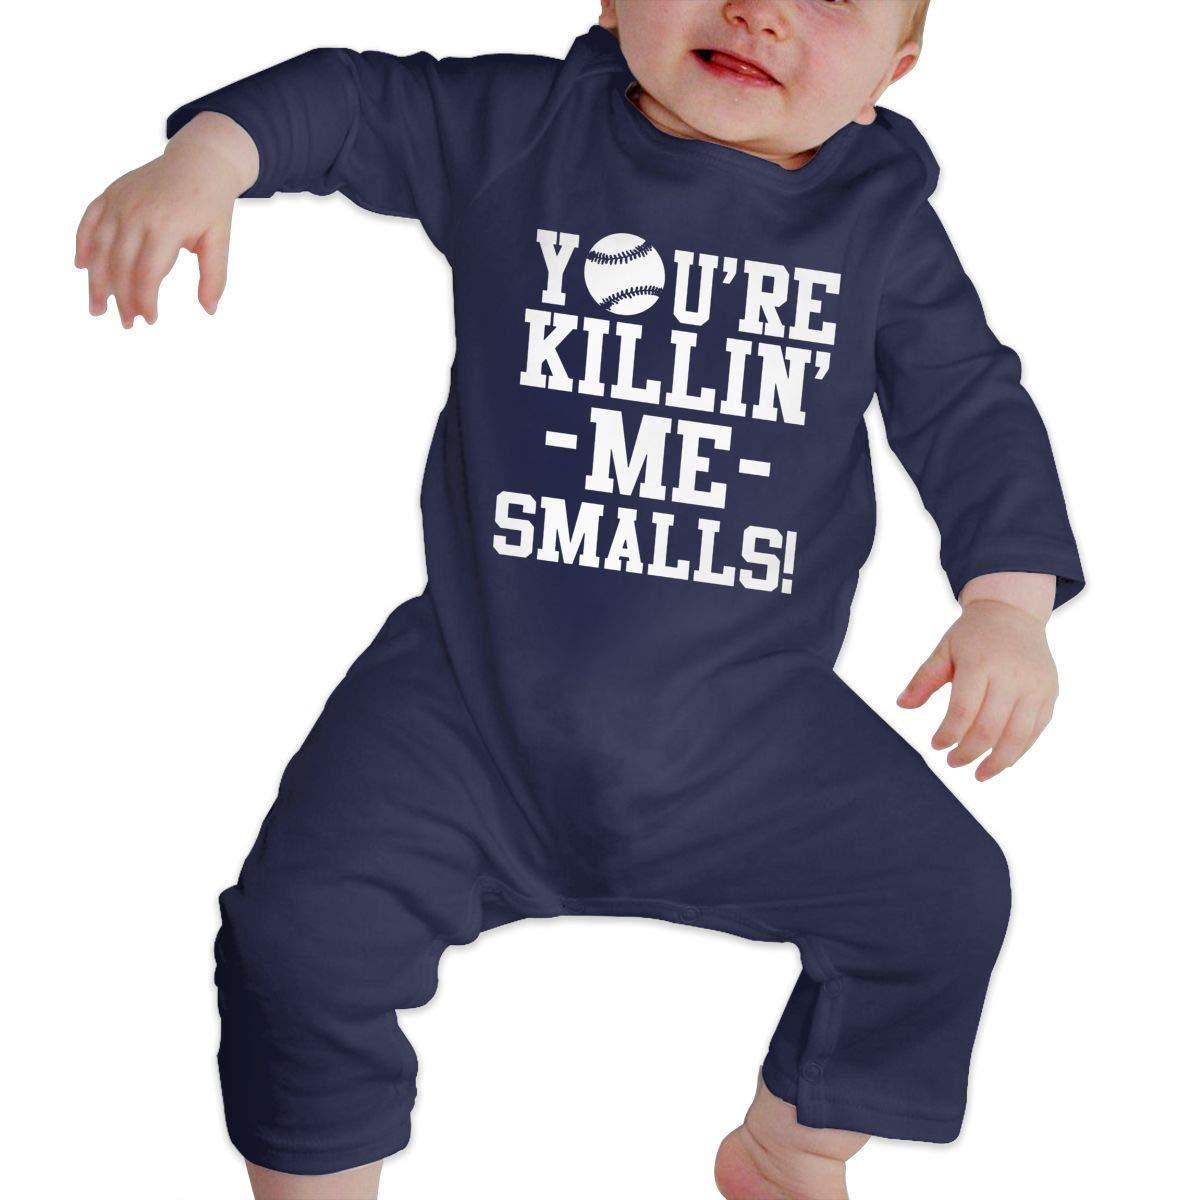 OASCUVER Dream-R Killin Me Smalls Newborn Babys Boys /& Girls Short Sleeve Jumpsuit Outfits for 0-24 Months Black